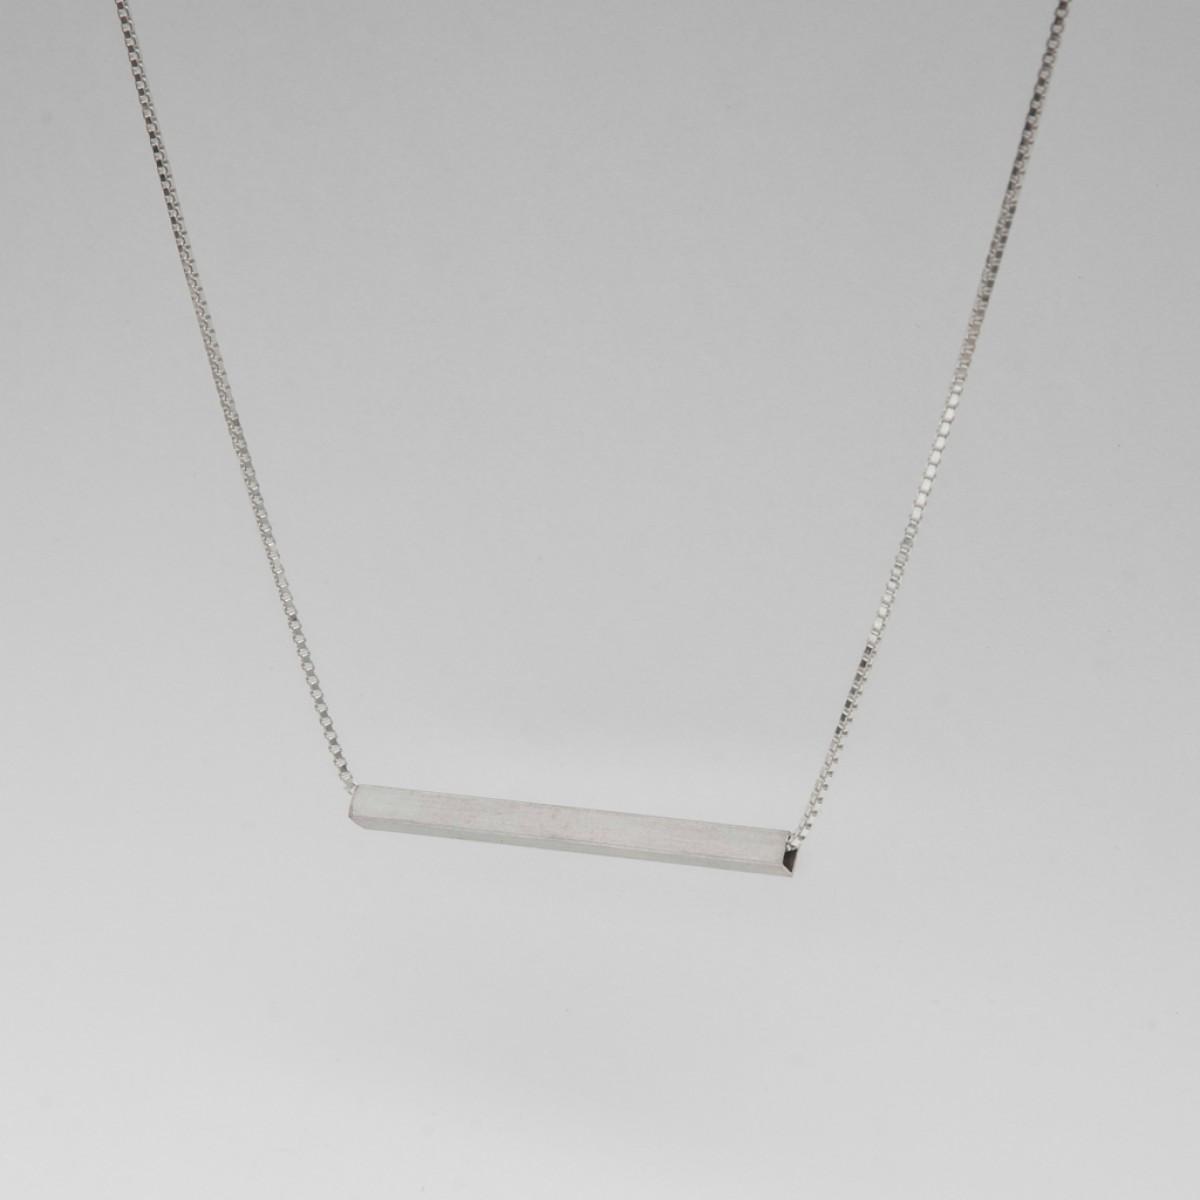 Jonathan Radetz Halskette SQUARE 40, Silber 925